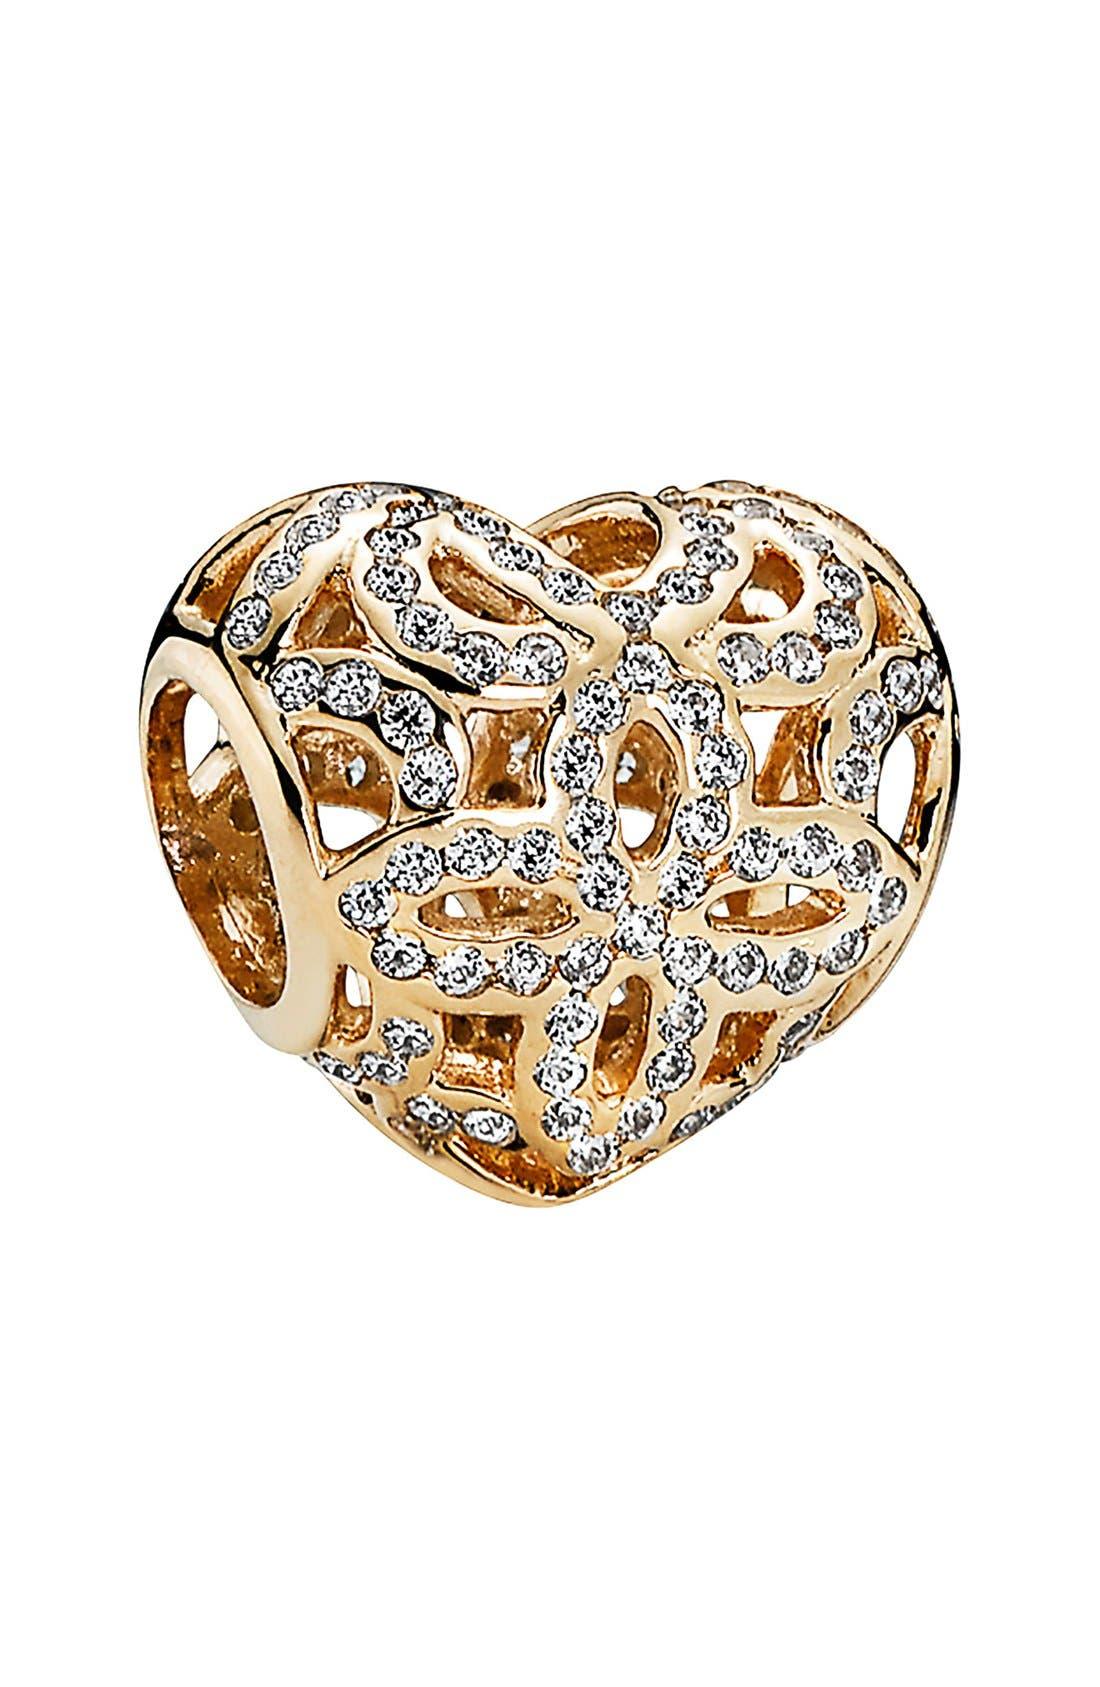 Main Image - PANDORA 'Love Appreciation' Charm